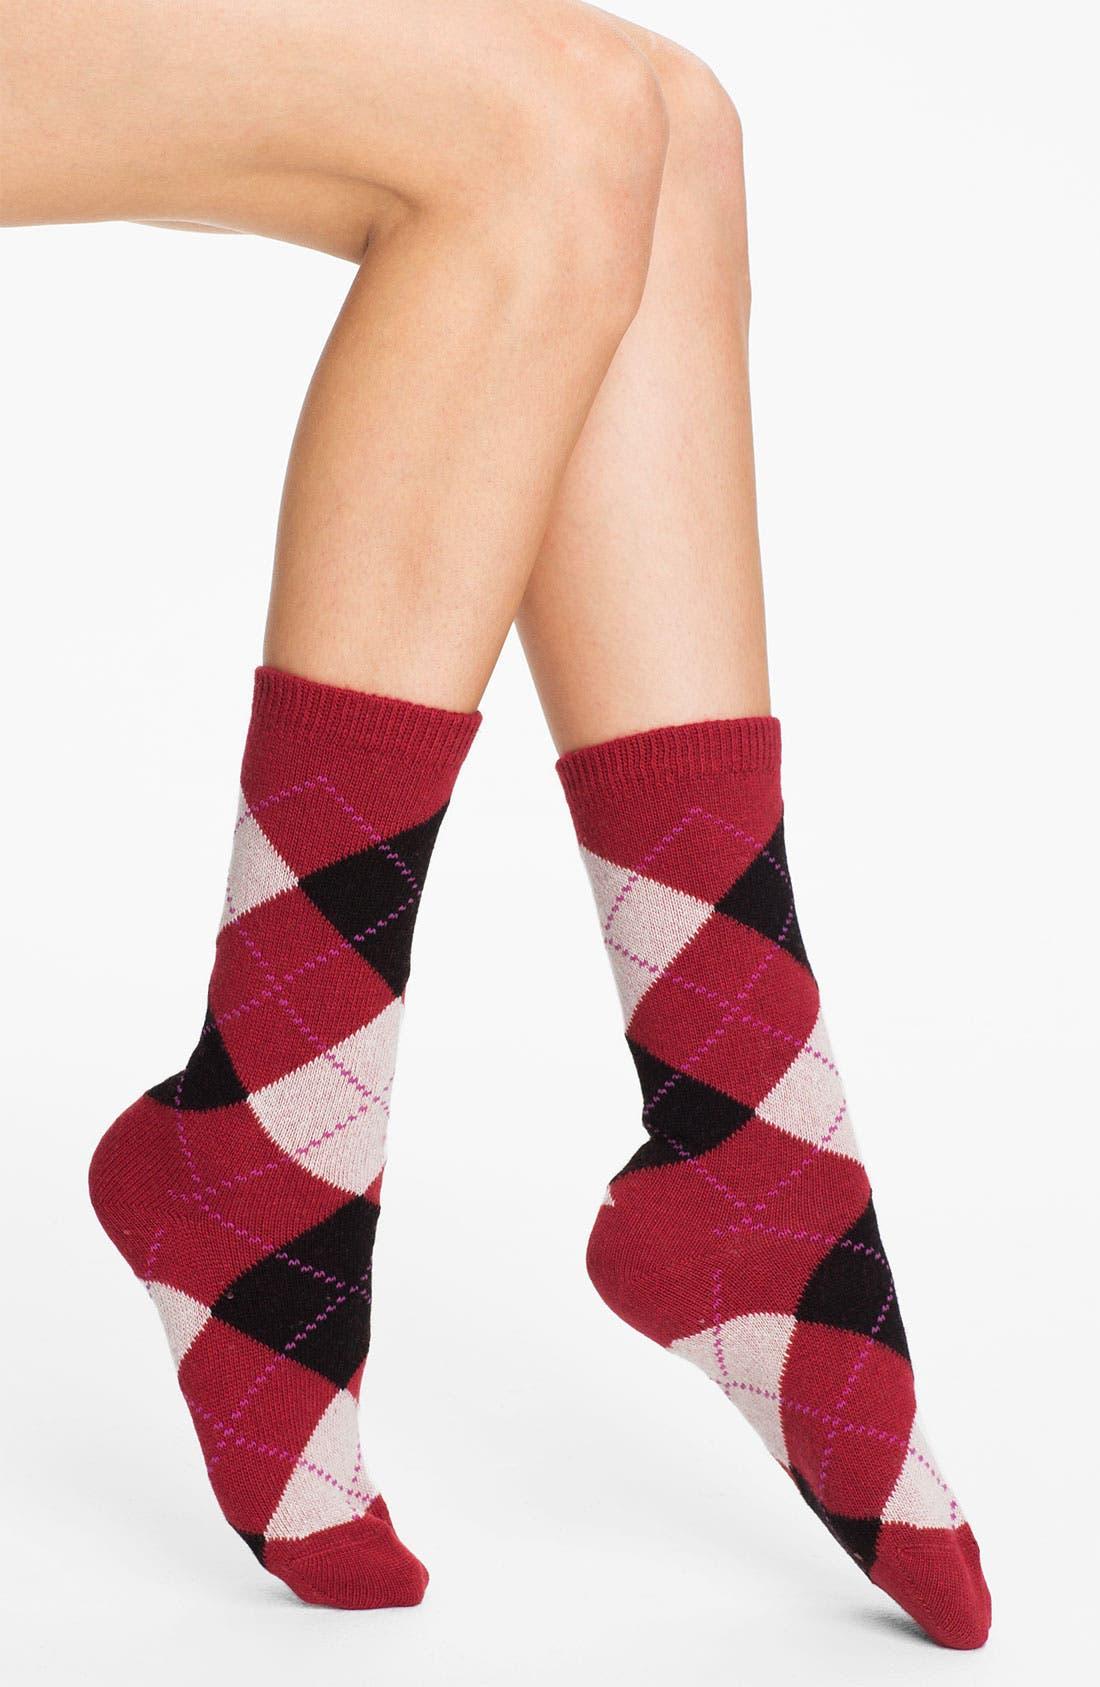 Alternate Image 1 Selected - Nordstrom Argyle Crew Socks